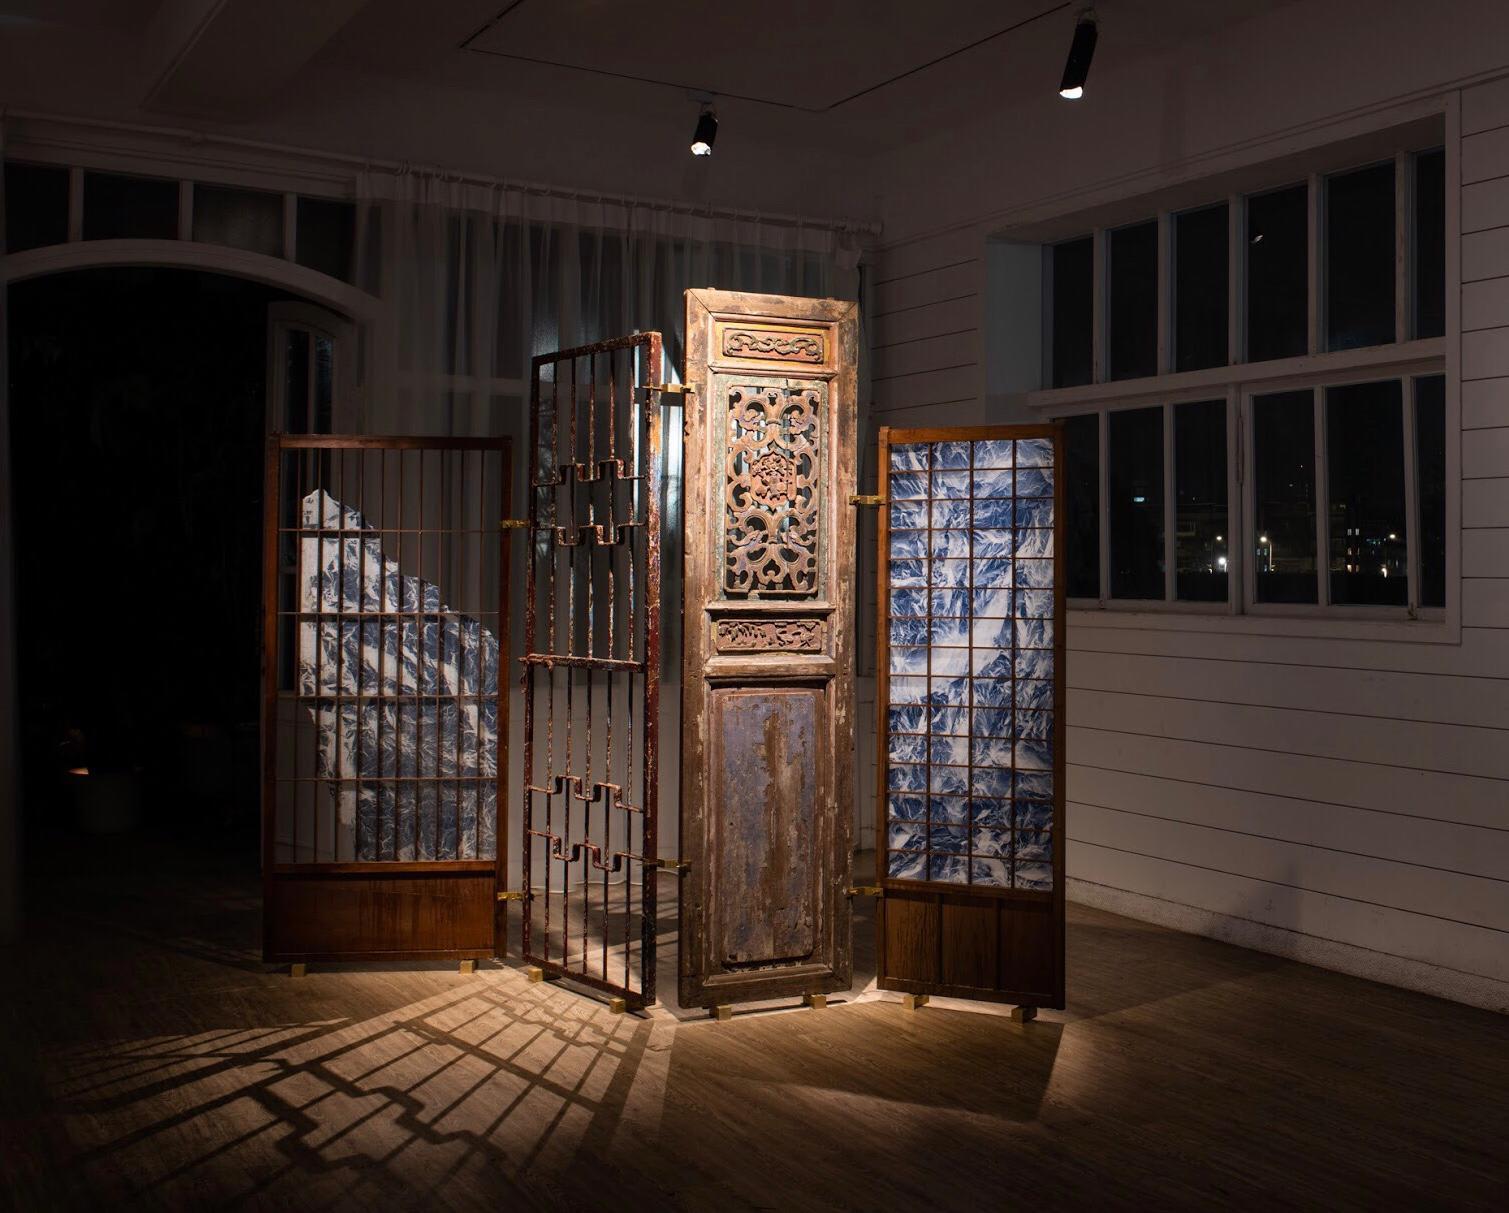 Wu Chi-Tsung 吳季璁, Wrinkled Texture - Folding Screen 001 皴法習作 屏風之一, 2019